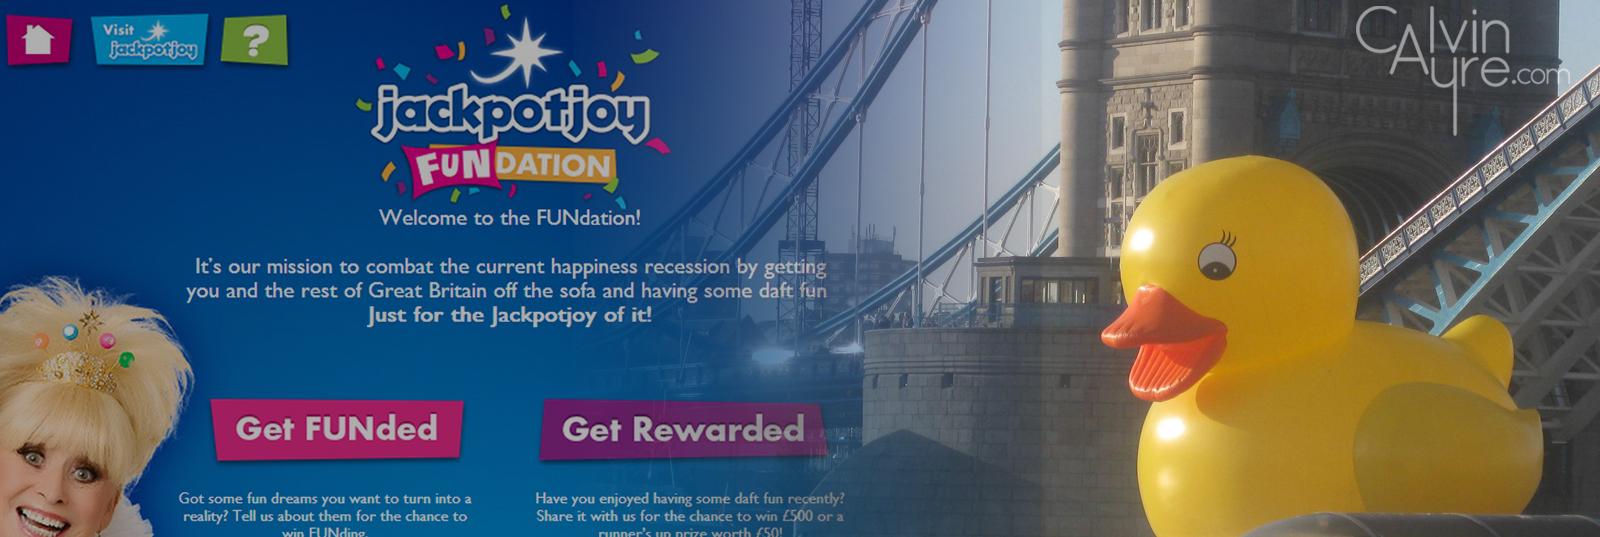 Jackpot Joy FUNdation Facebook App, Gamesys Giant Rubber Duck on Thames